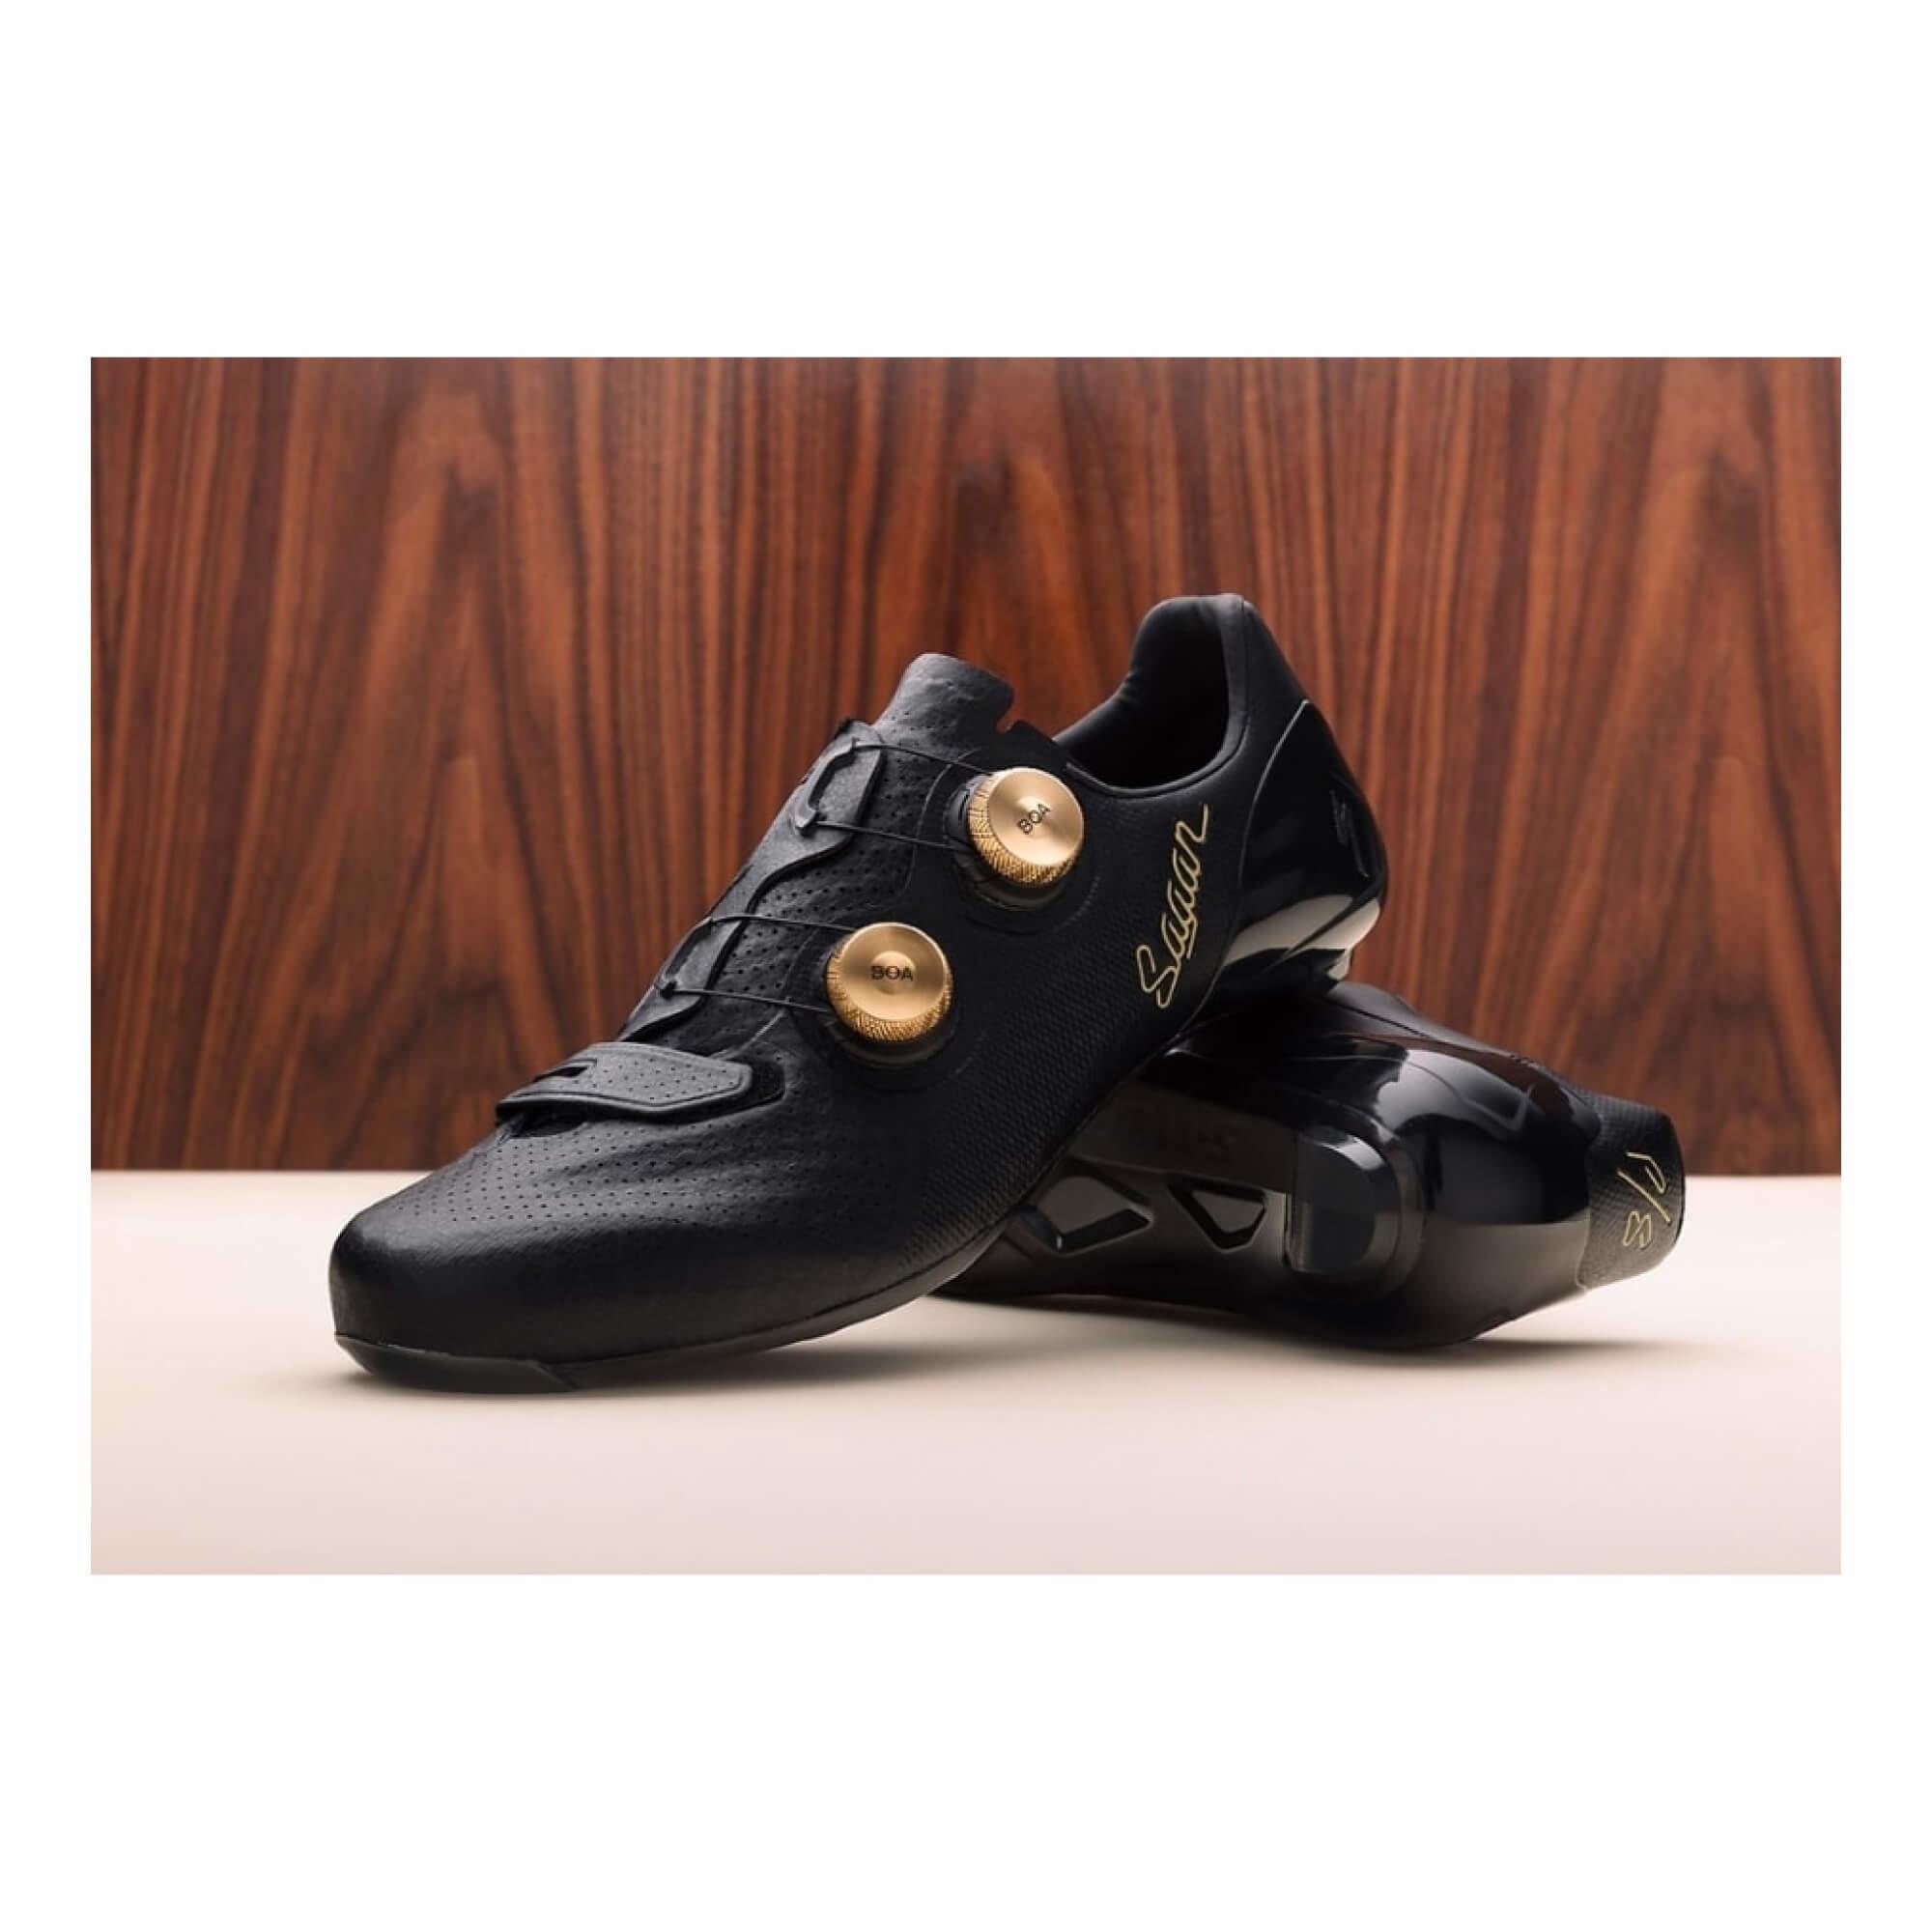 S-Works 7 Road Shoe Sagan Disruption LTD 2022-5